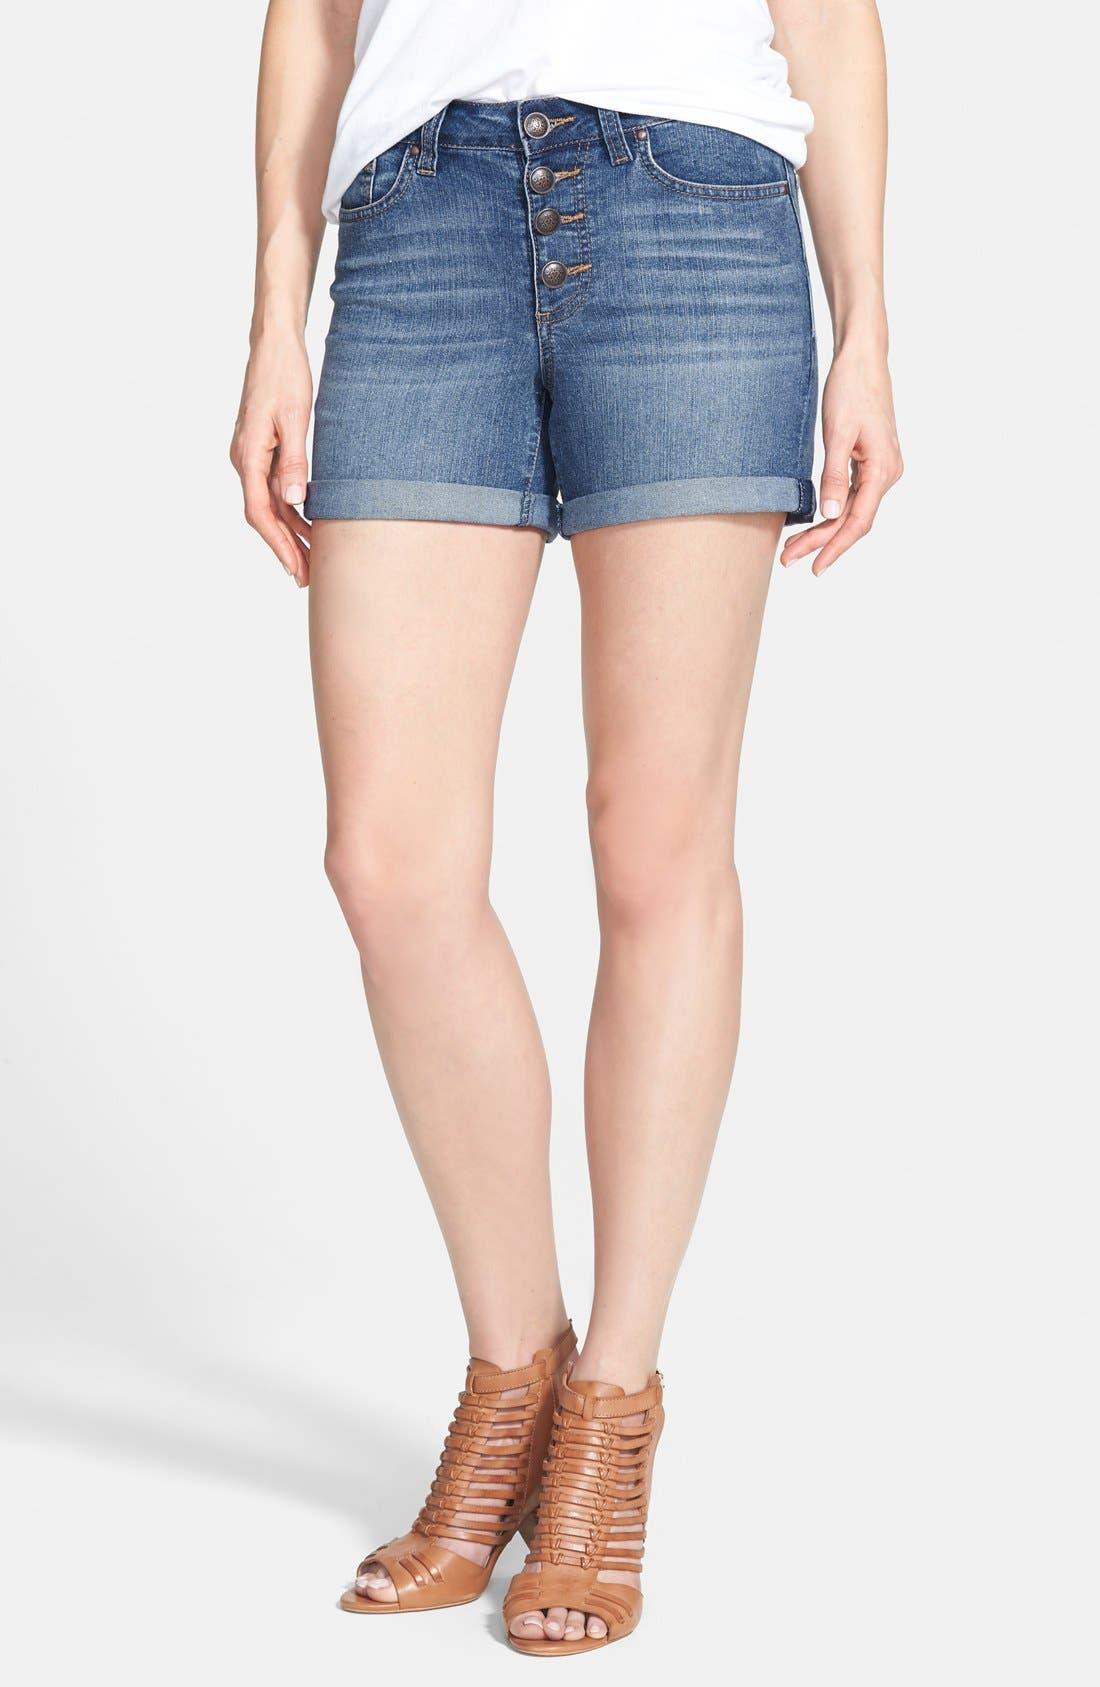 Alternate Image 1 Selected - Jessica Simpson 'Vintage' High Waist Denim Shorts